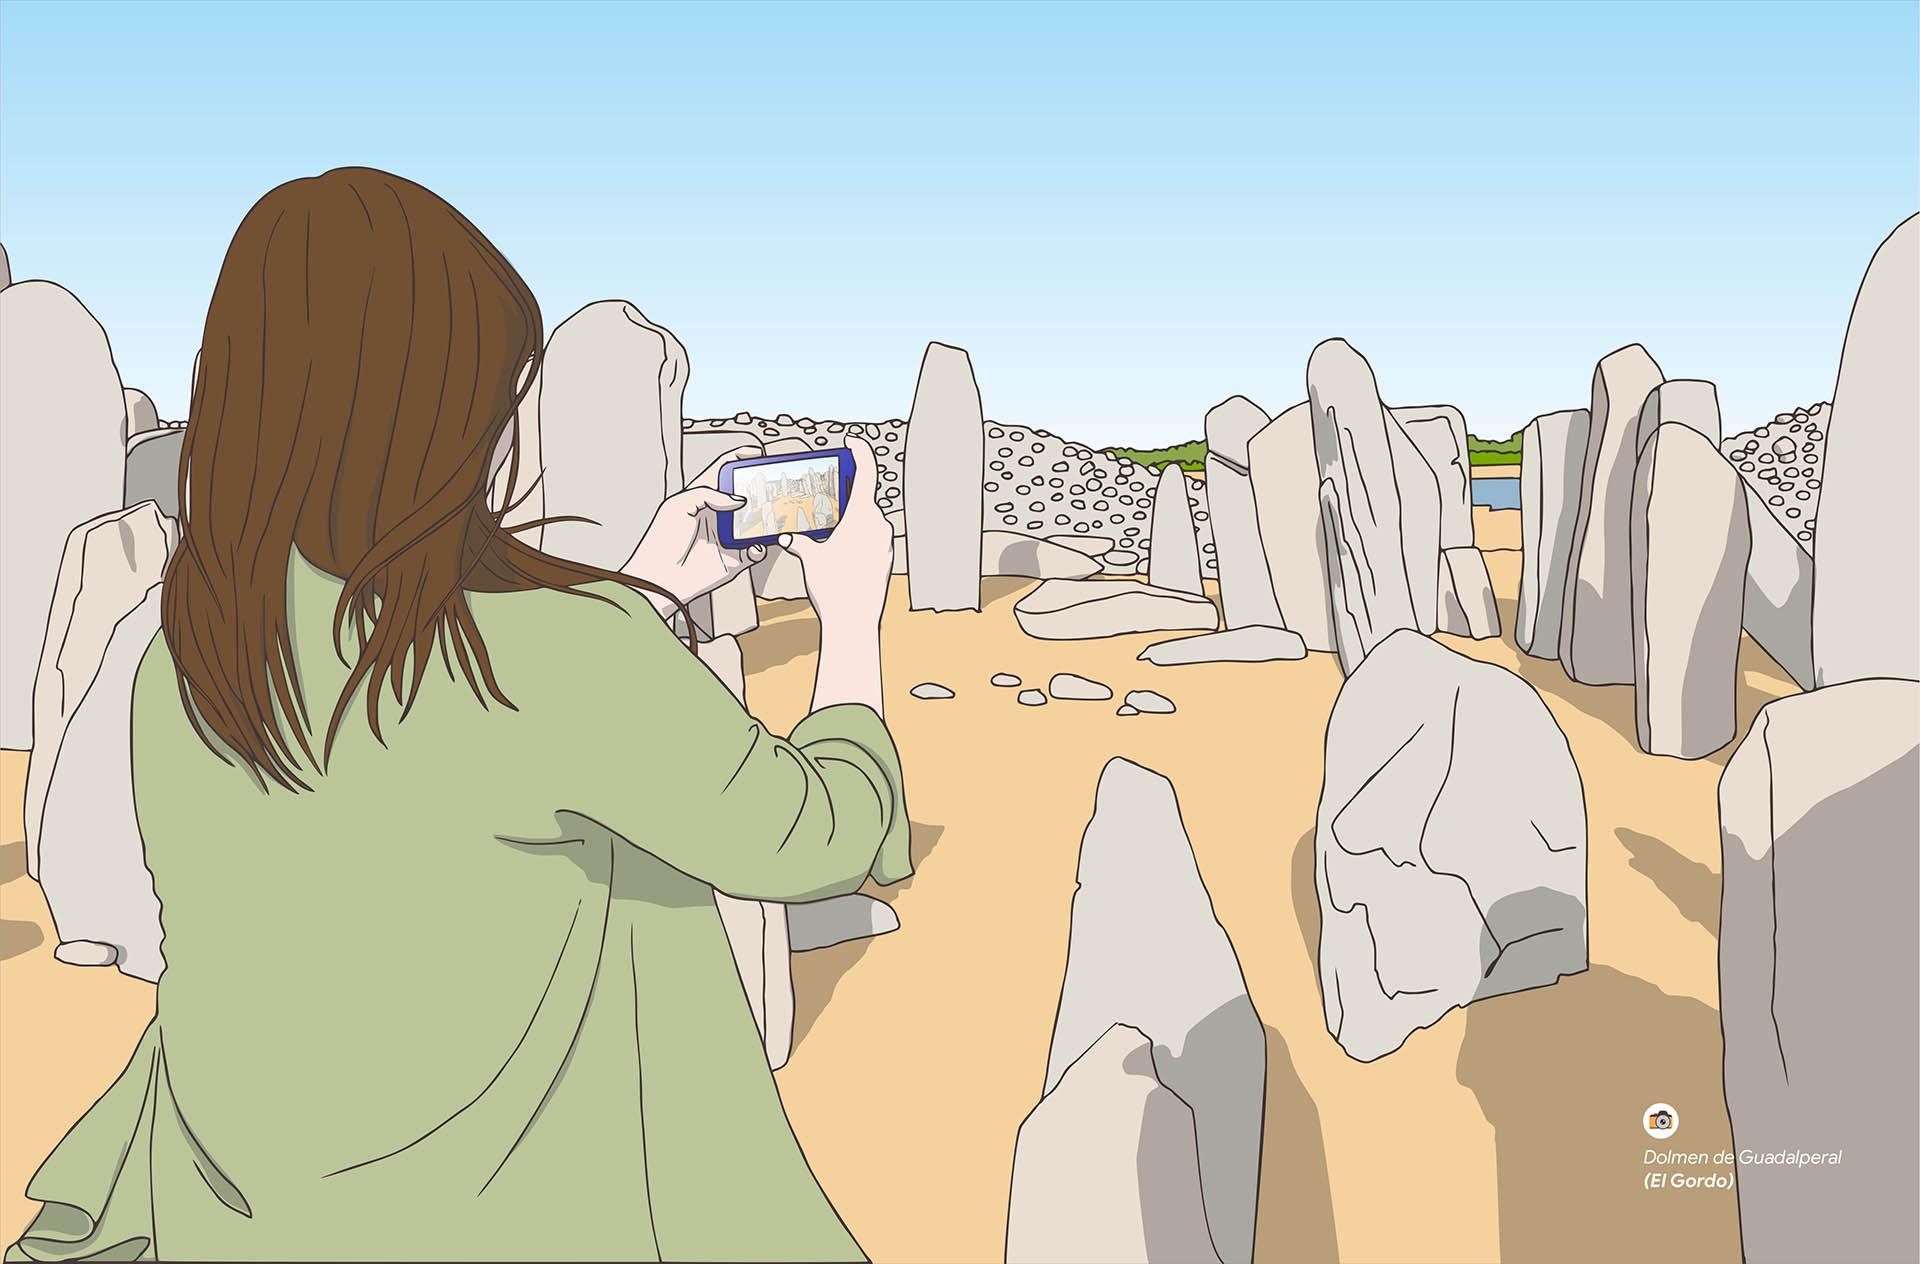 azul-piedra-campo-aranuelo-dolmen-guadalperal